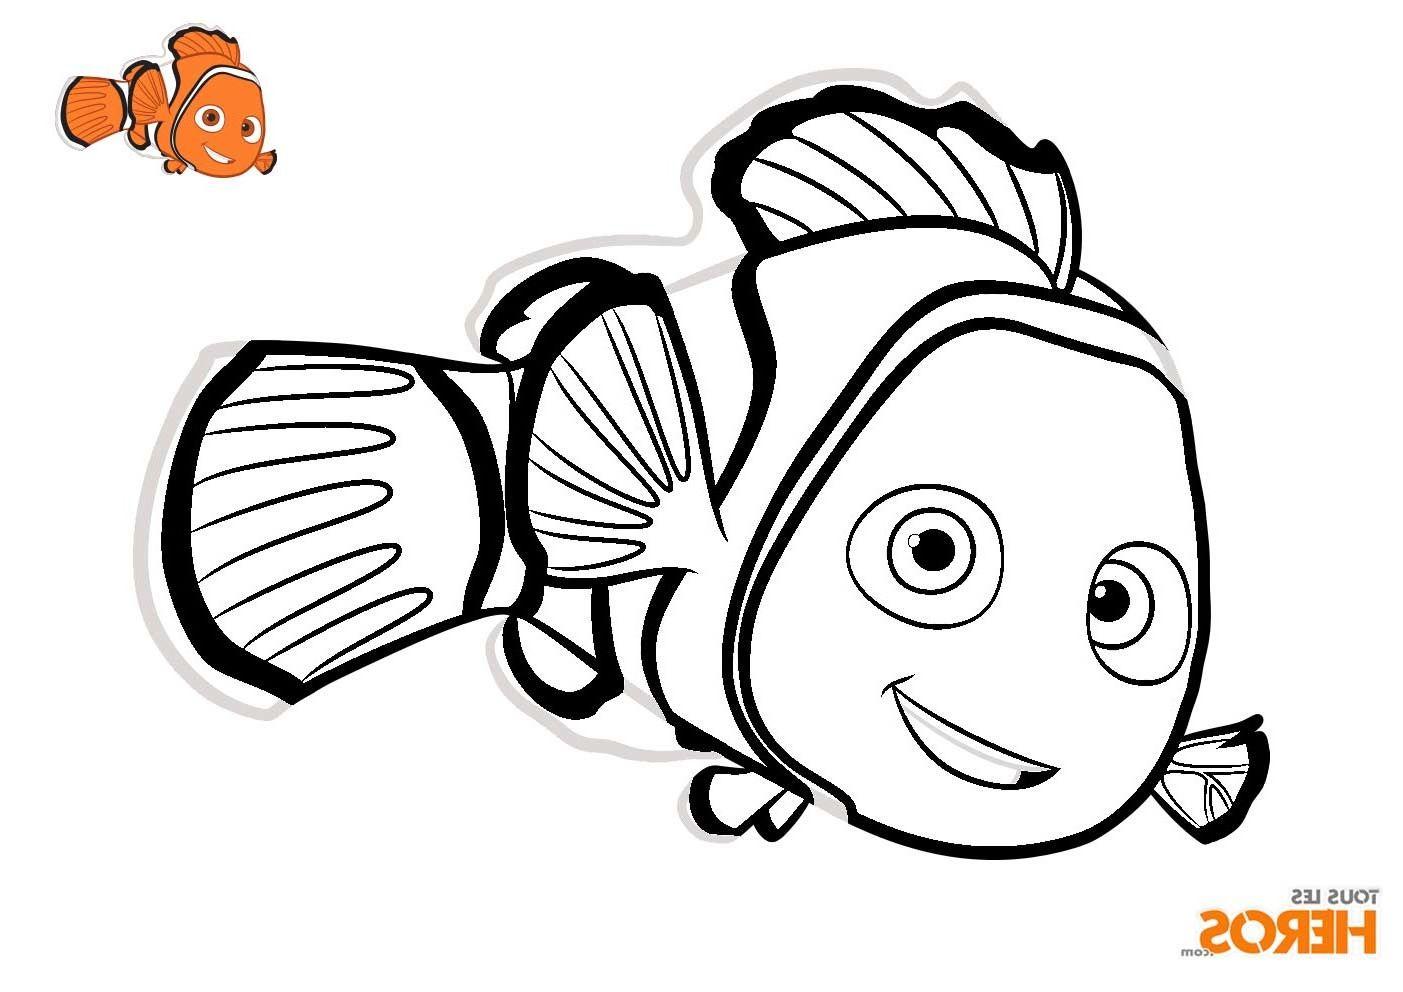 12 Impressionnant De Coloriage Nemo Photos Nemo Enamel Pins